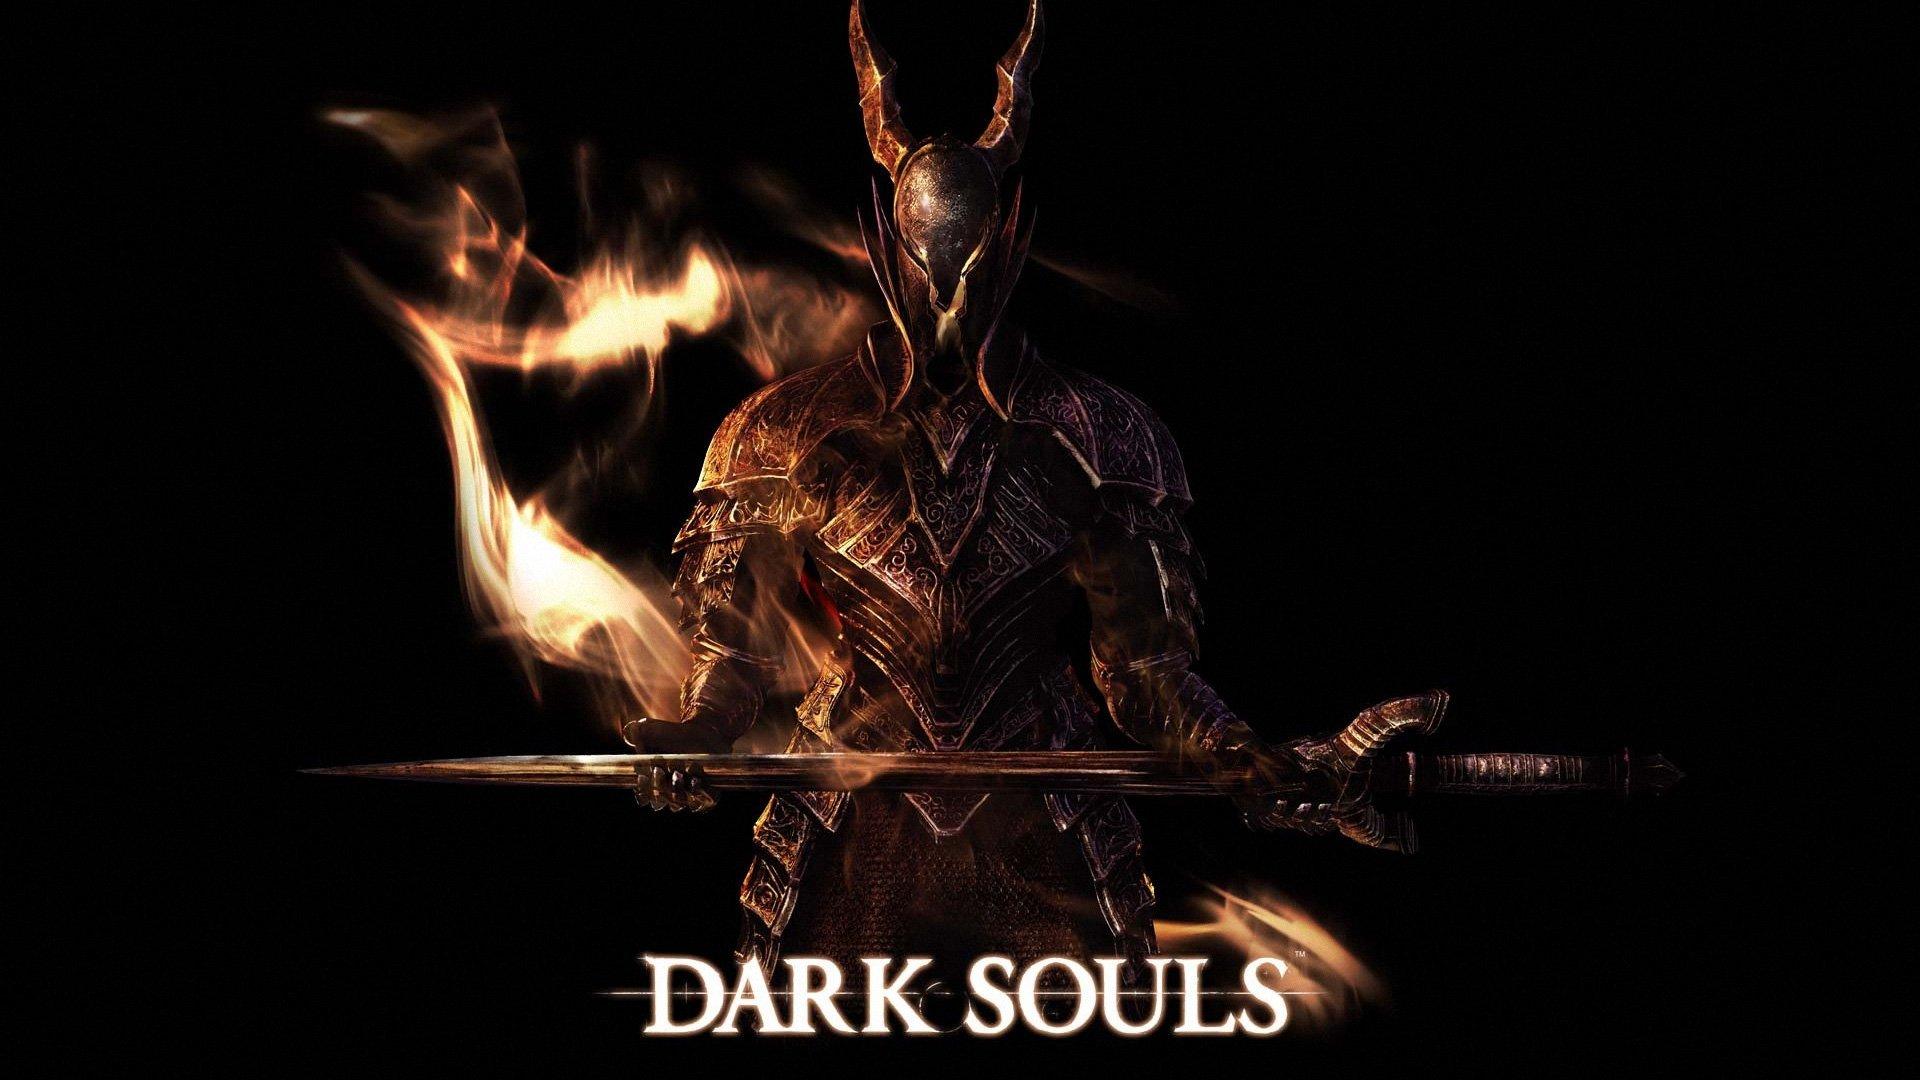 dark souls 3 wallpaper 1080p - photo #15